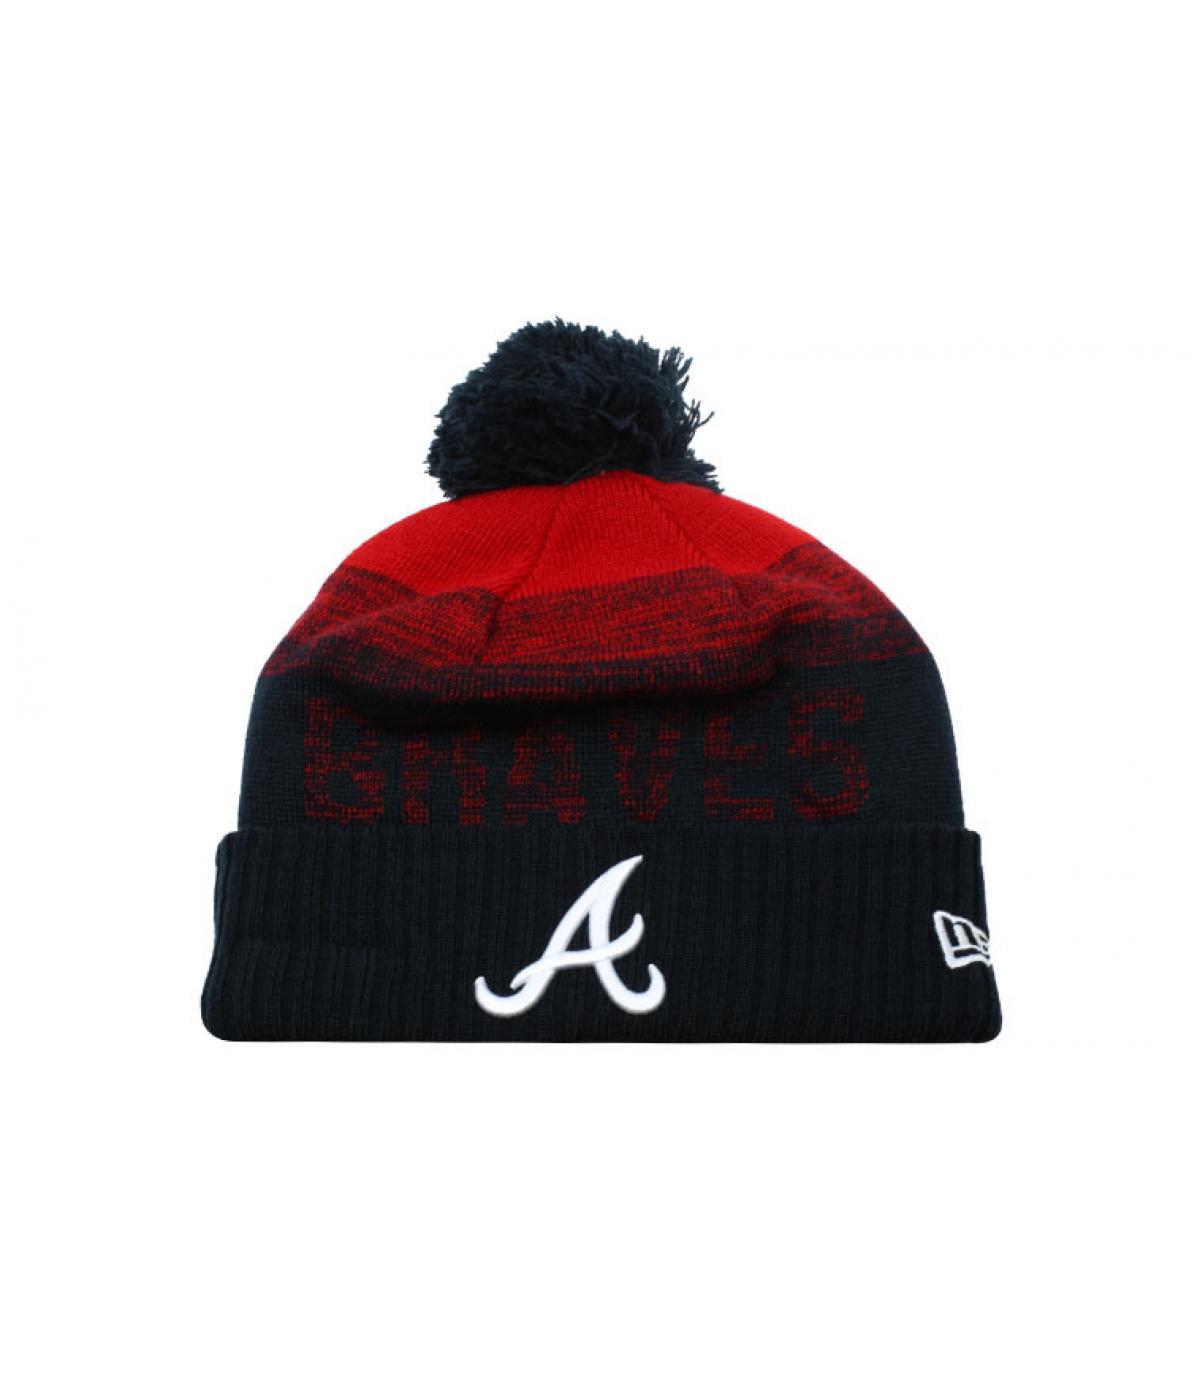 Details Mütze MLB Sport Knit Atlanta - Abbildung 2